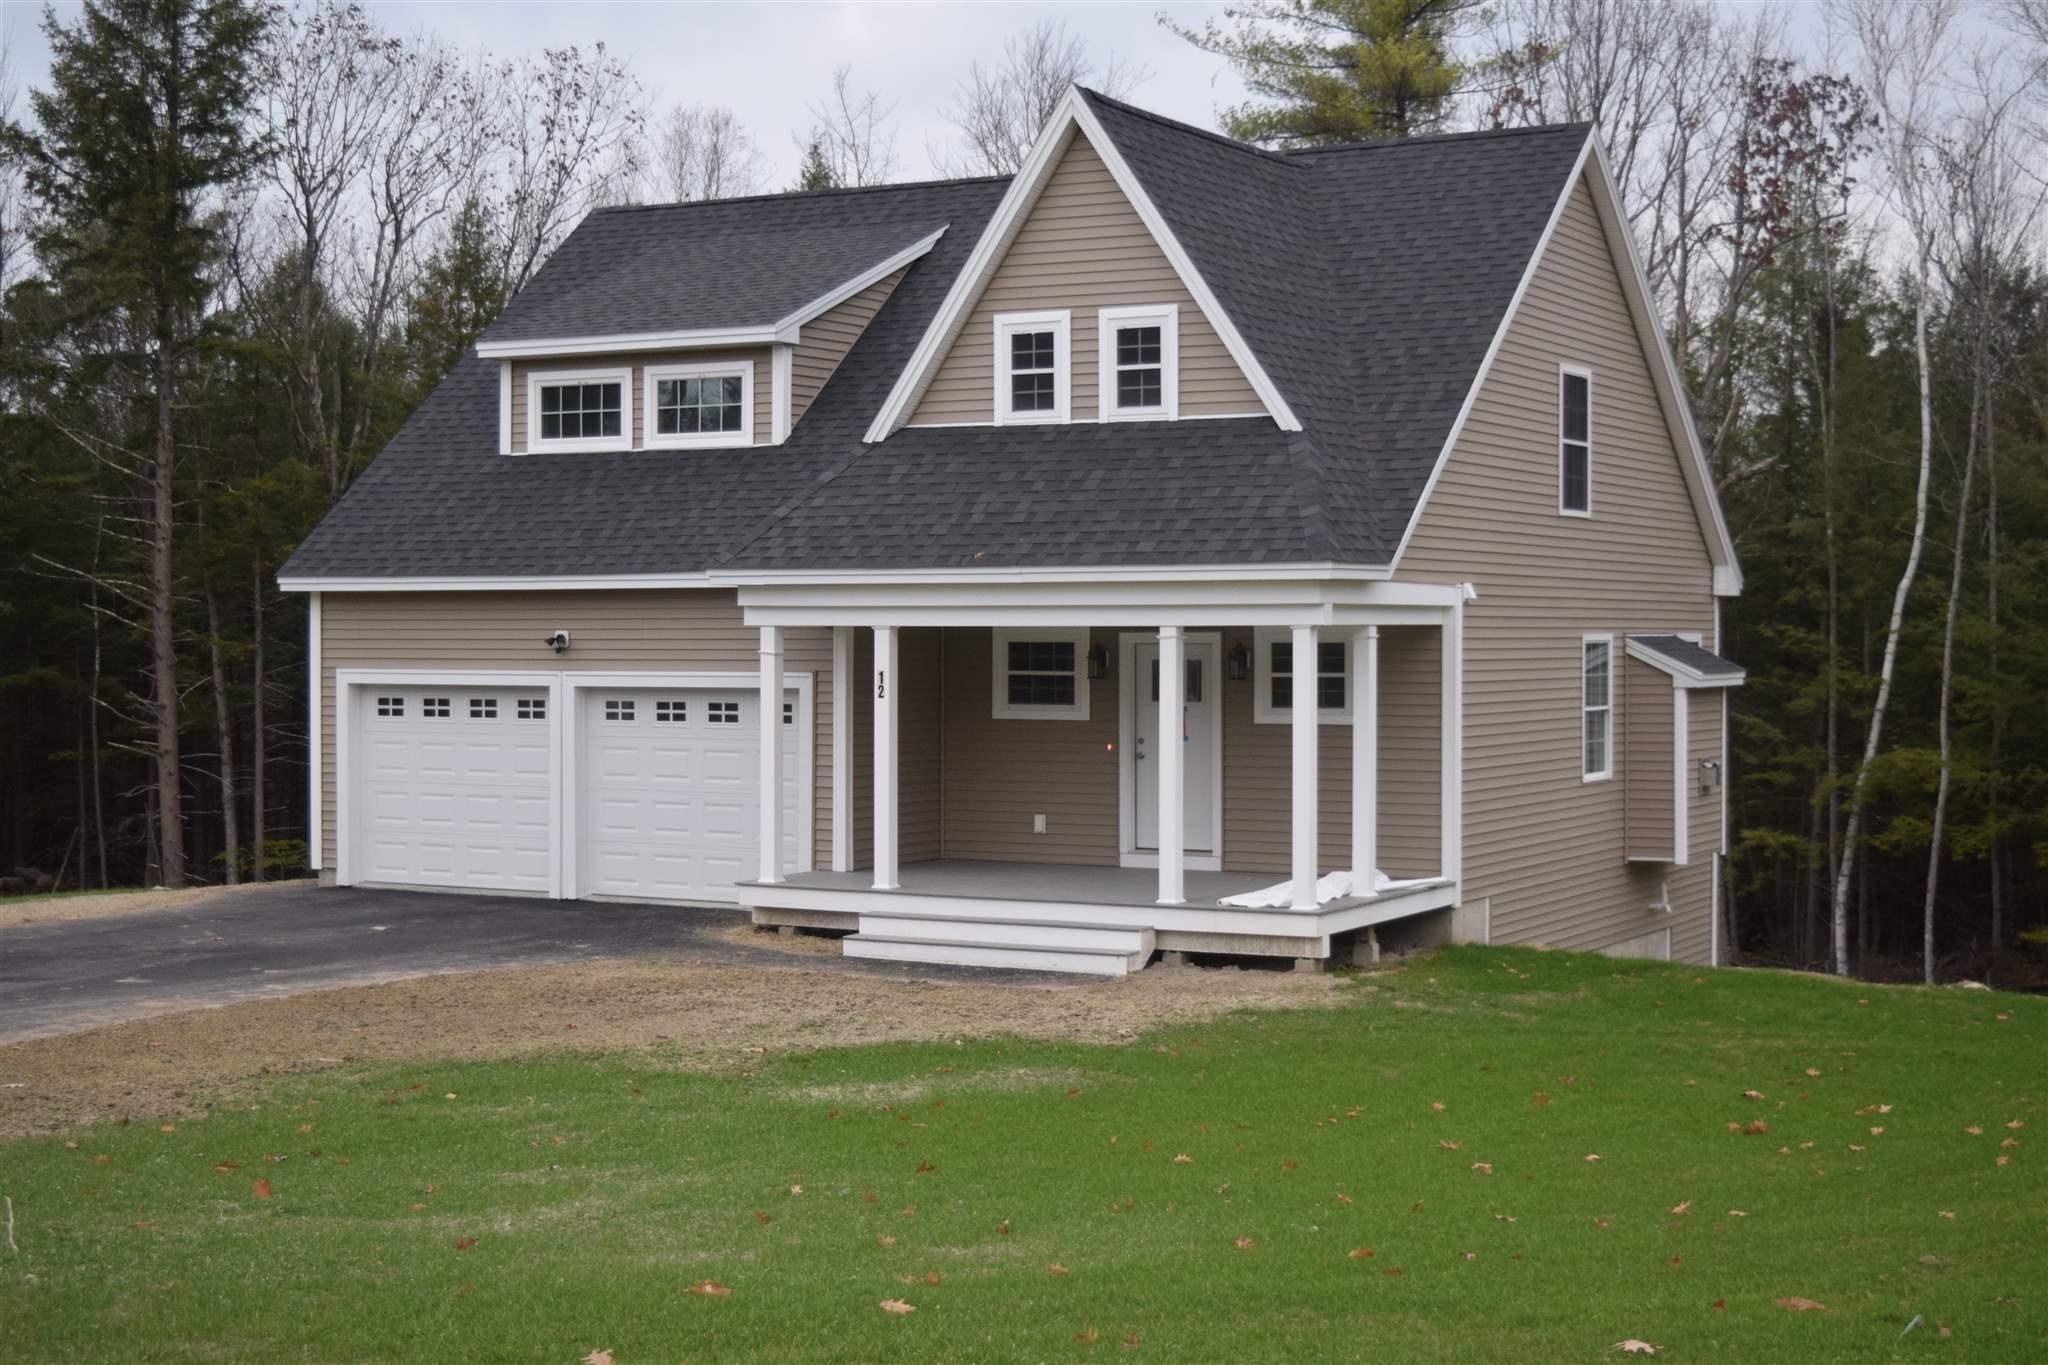 lot 10 Lakeside Estates 12 Overlook Dr